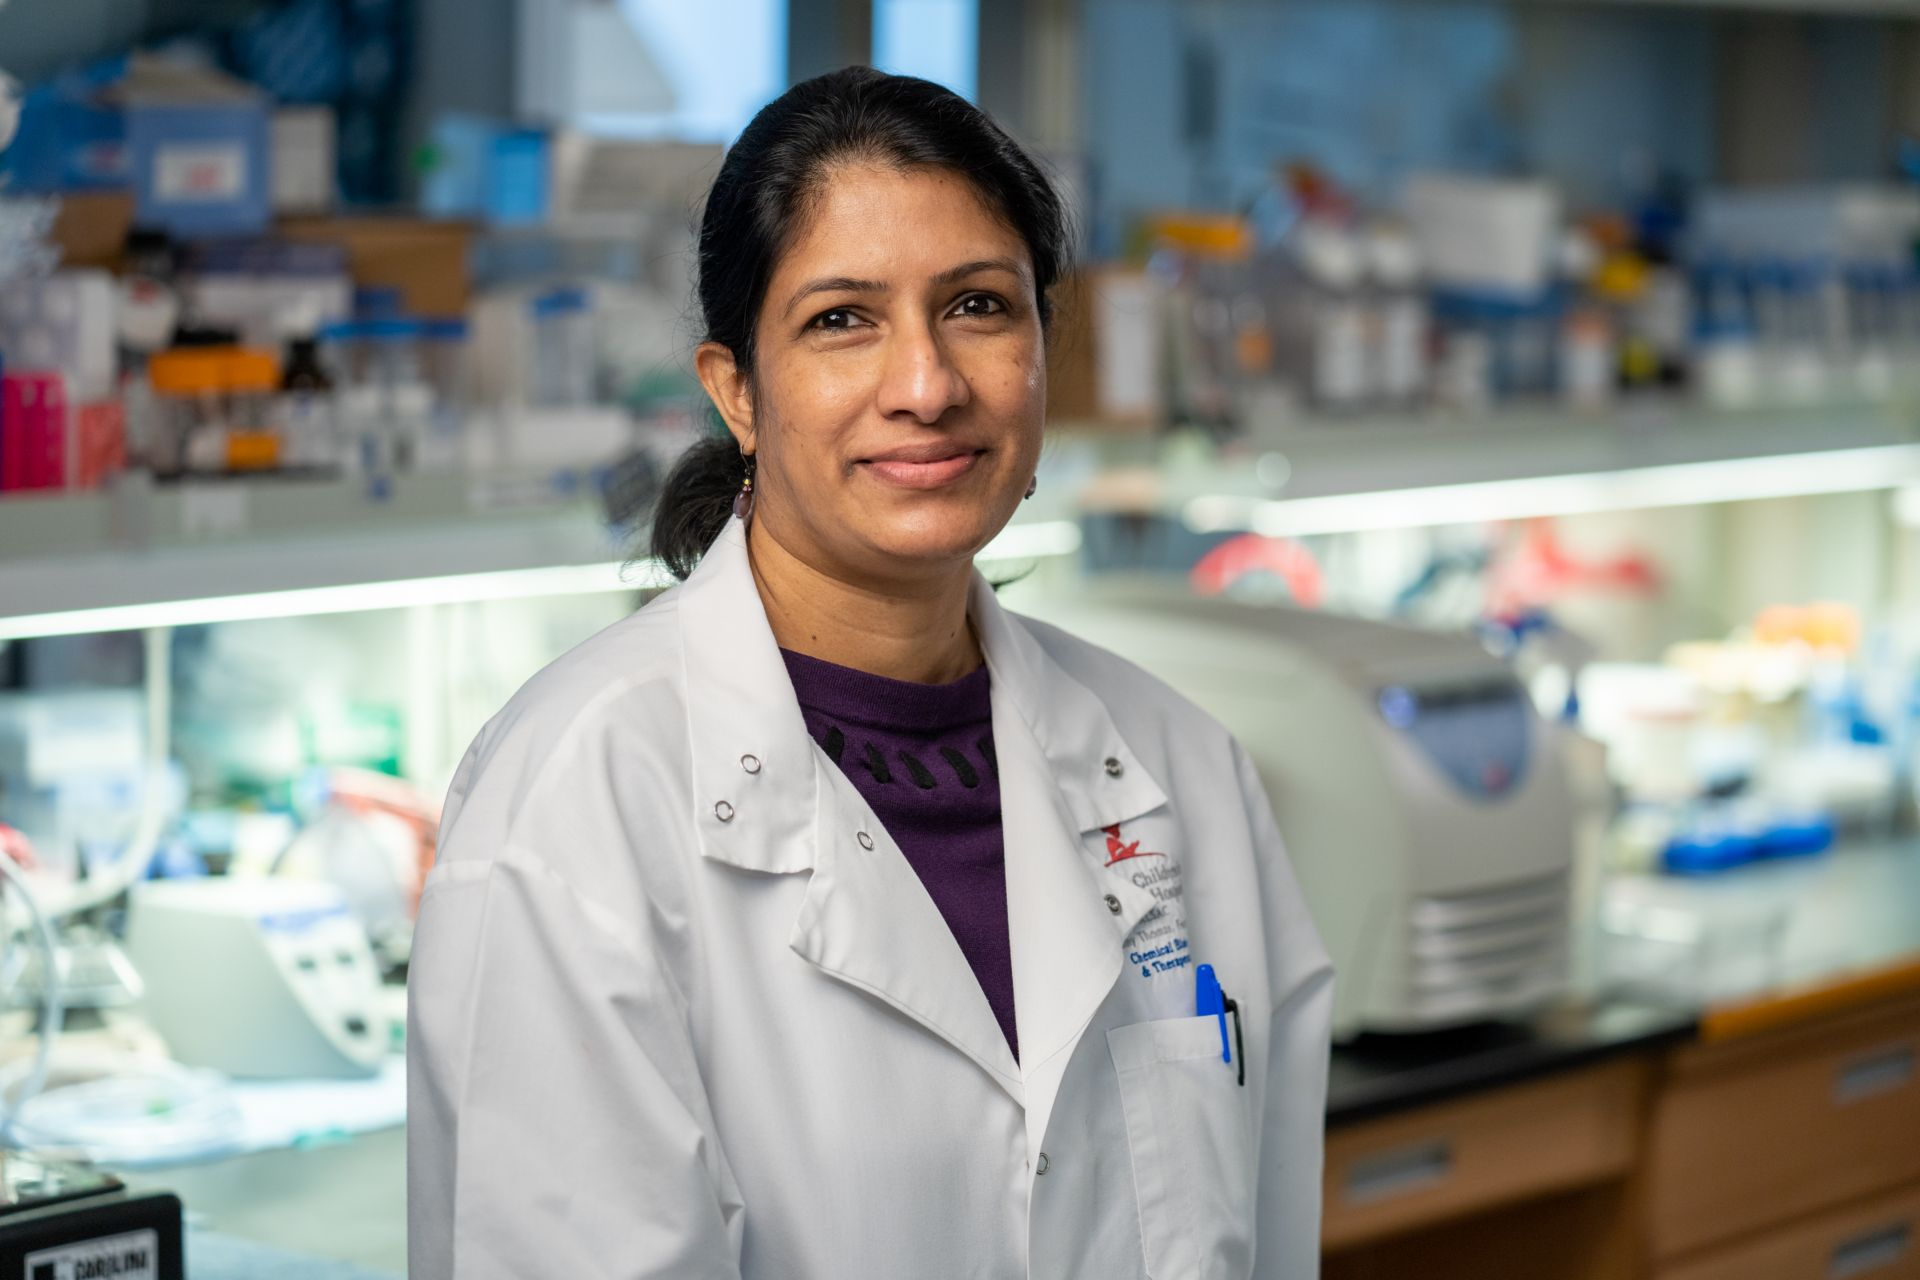 Teneema Kuriakose, DVM, PhD